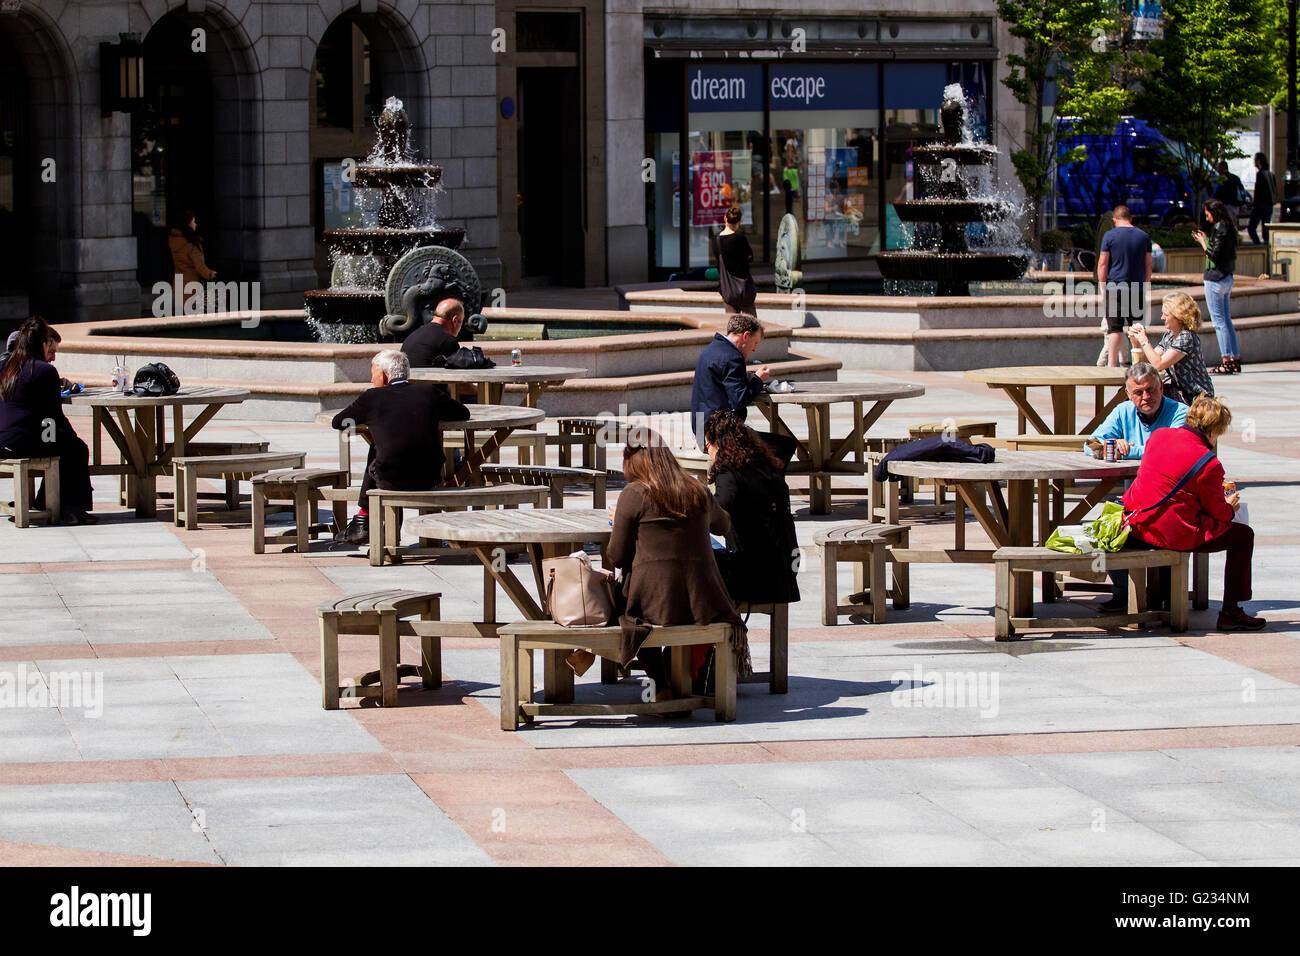 Dundee, Tayside, Scotland, UK. May 23rd 2016. UK Weather: Warm weather across Dundee. People relaxing and sitting - Stock Image